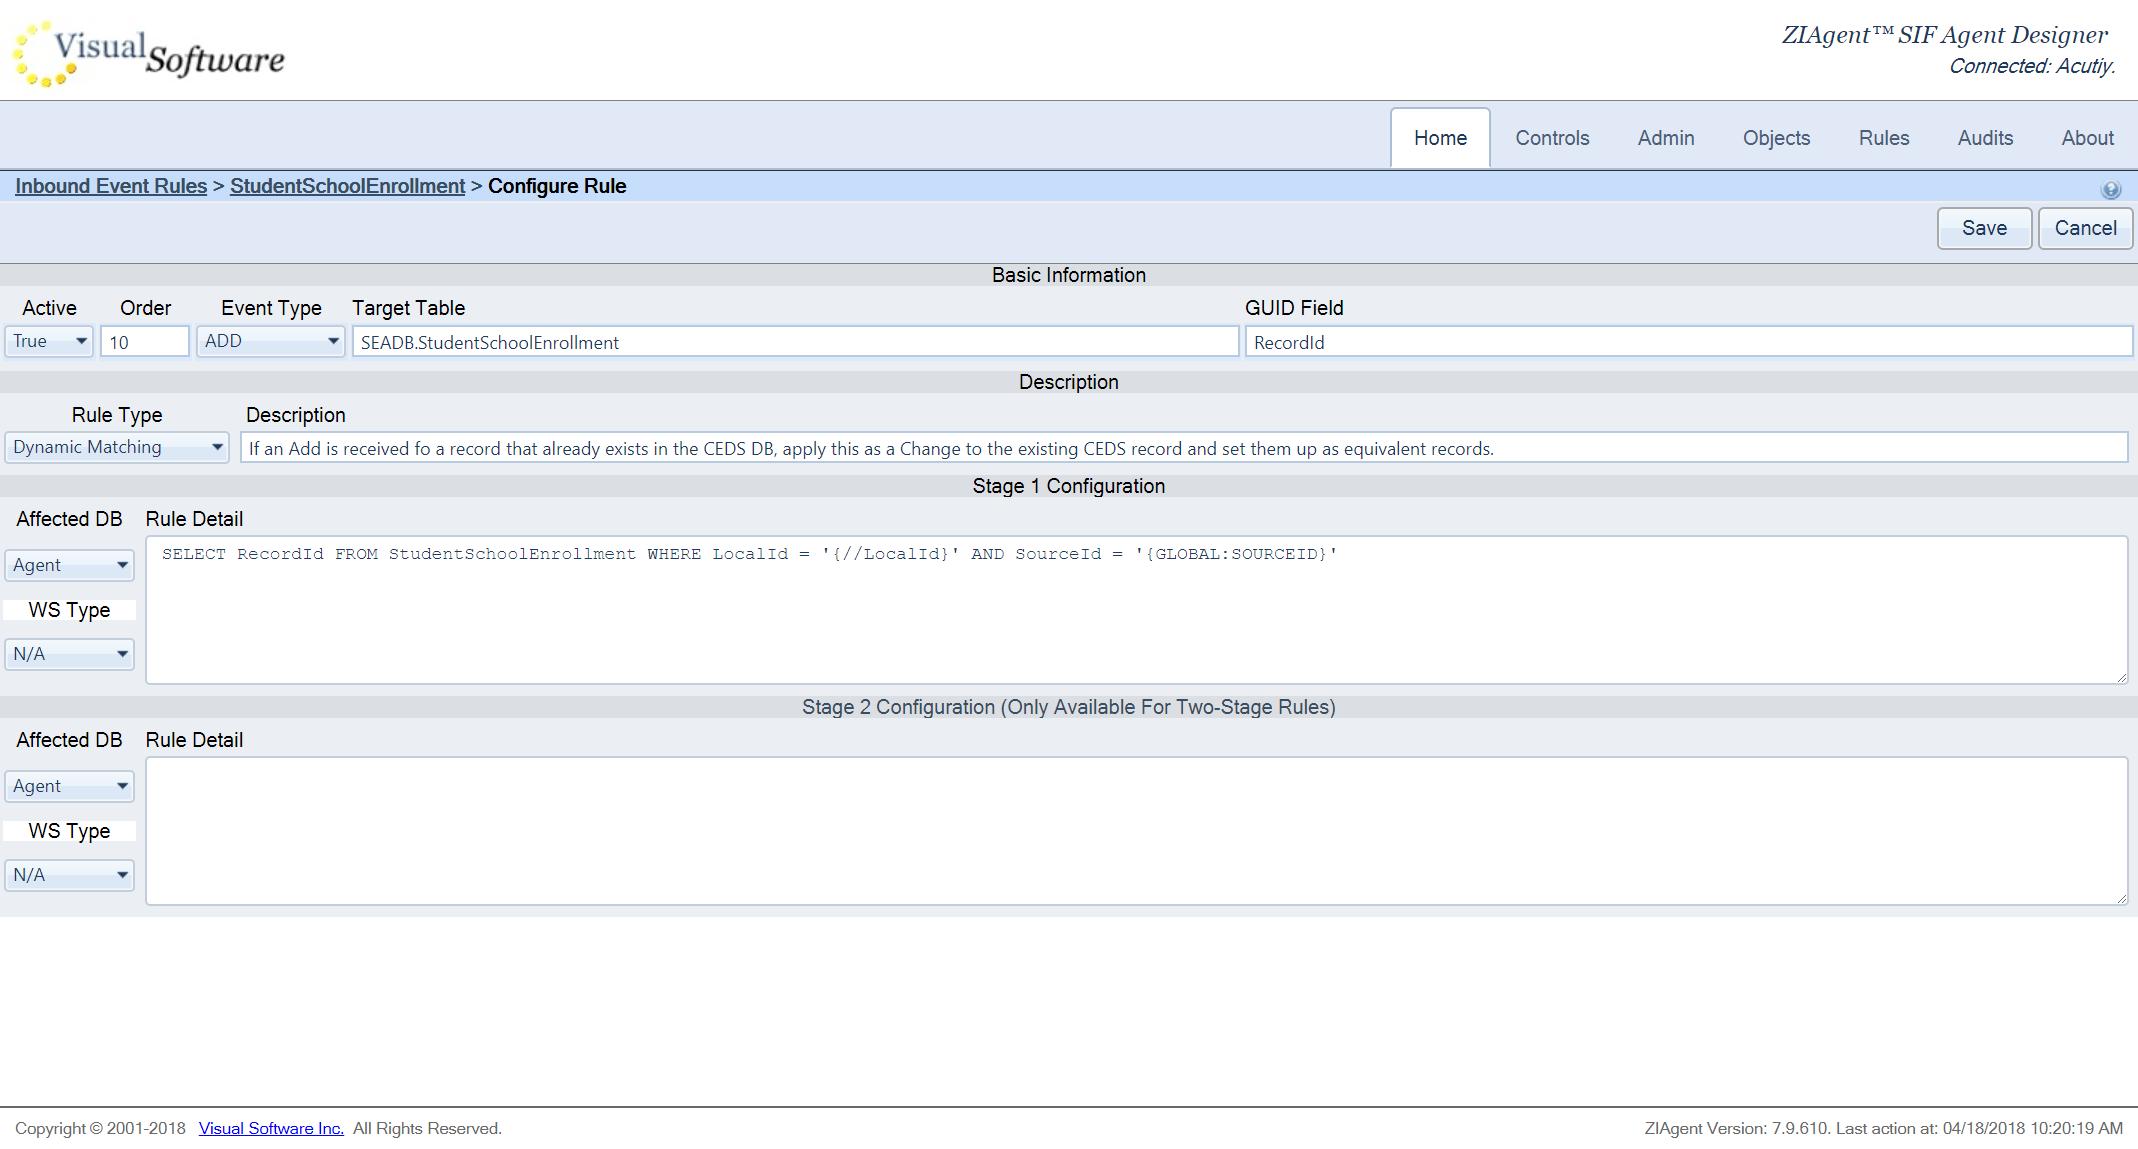 screencapture nacho vsioffice 8082 Designer EditRule aspx 2018 04 18 10 20 24 - ZIAgent - Configurable Application Adapter